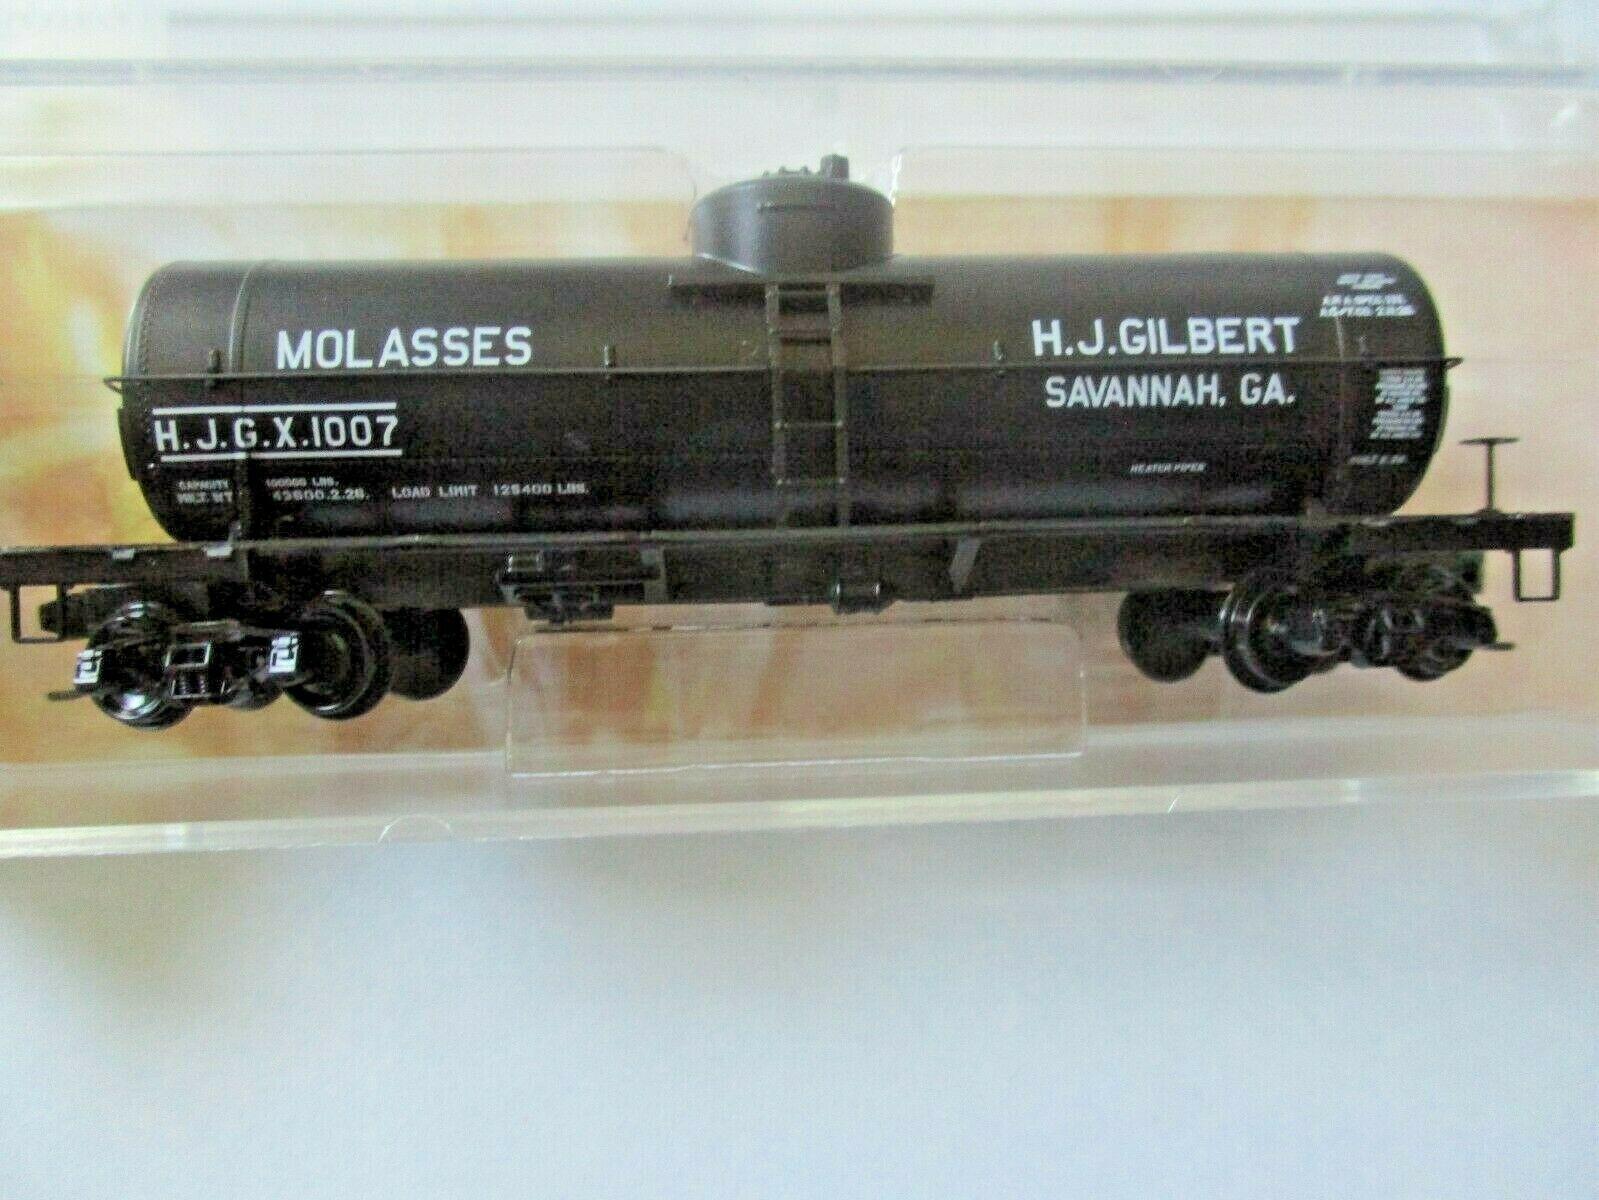 Micro-Trains # 06500186 HJ Gilbert Molasses 39'  Tank Car Car # 6 N-Scale